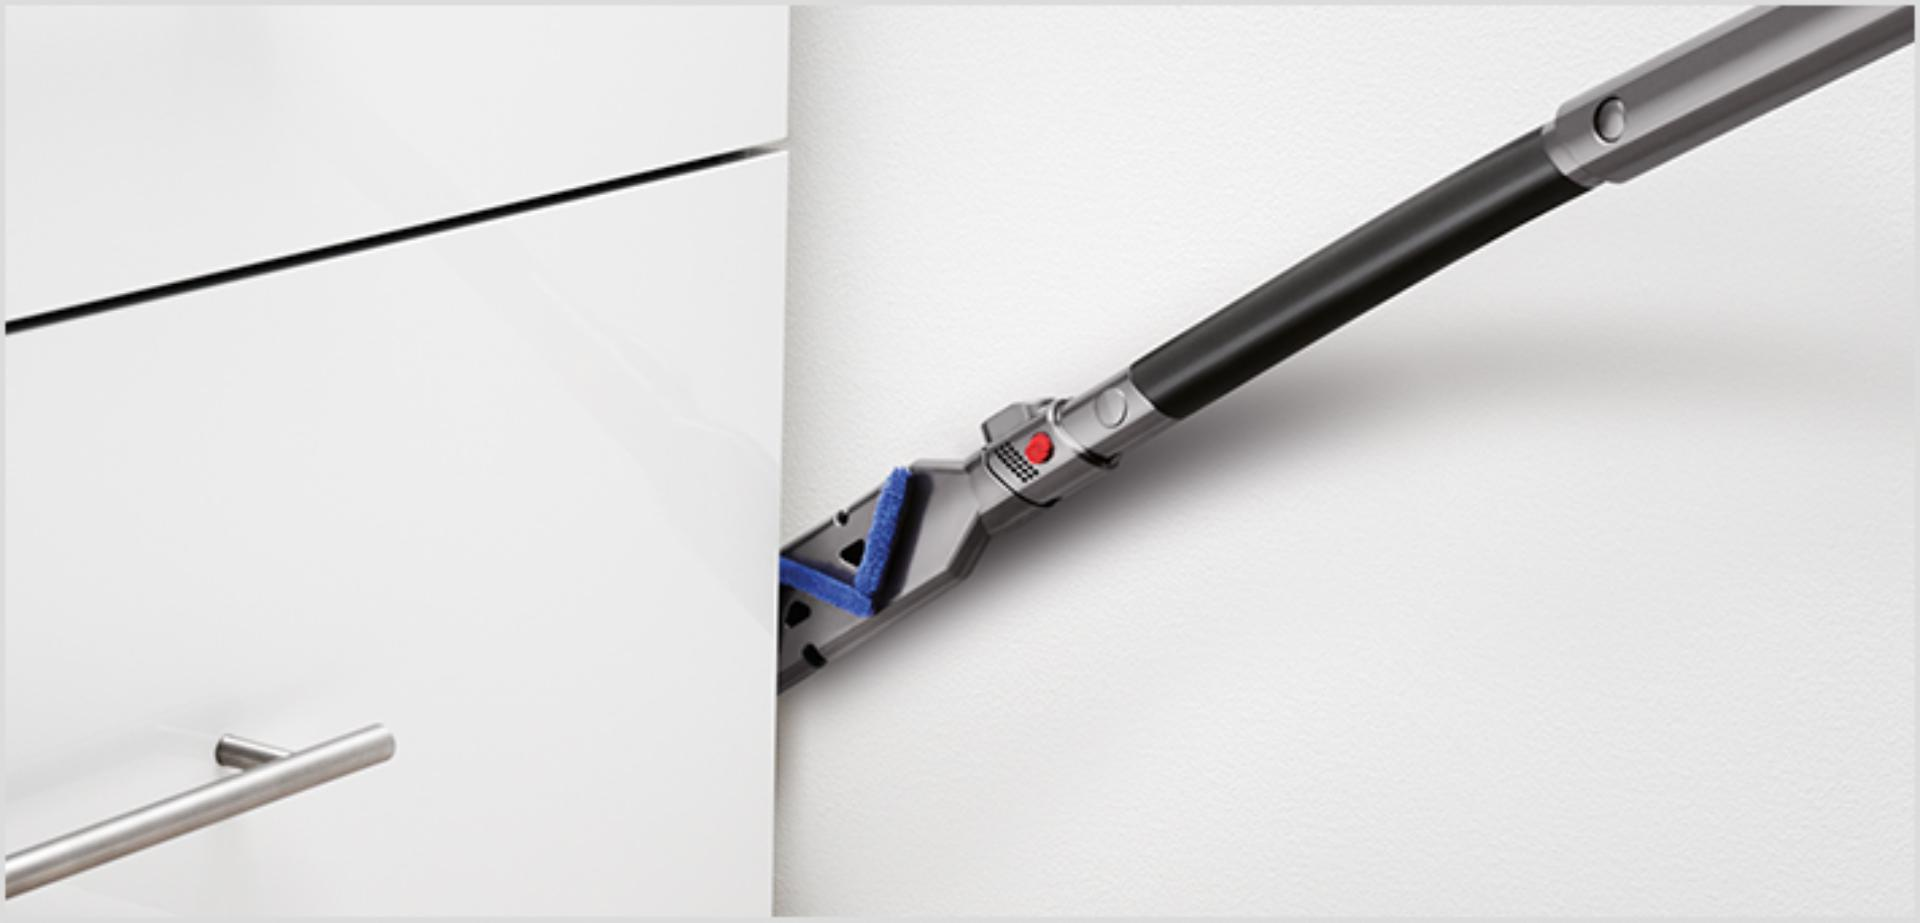 Reach-under tool